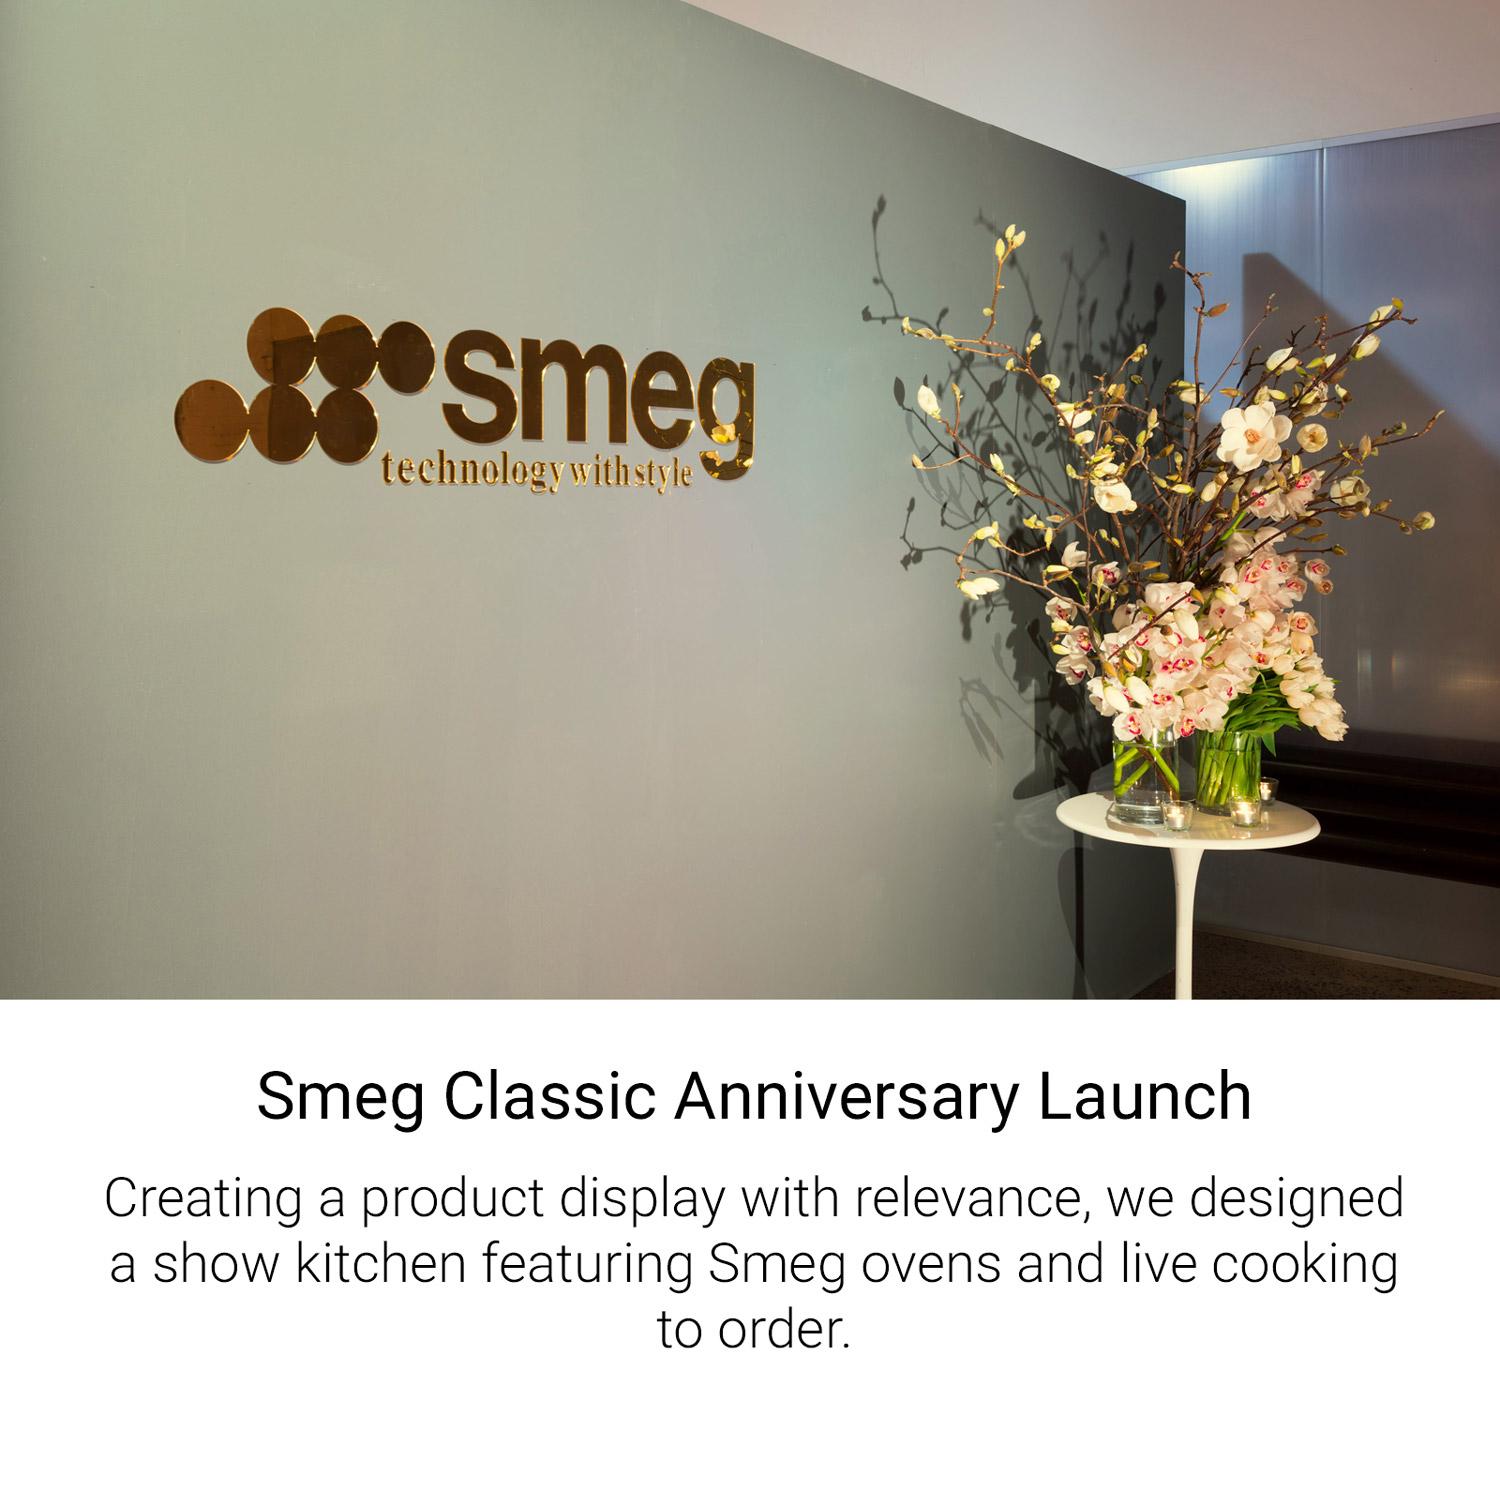 Smeg Classic Anniversary Launch